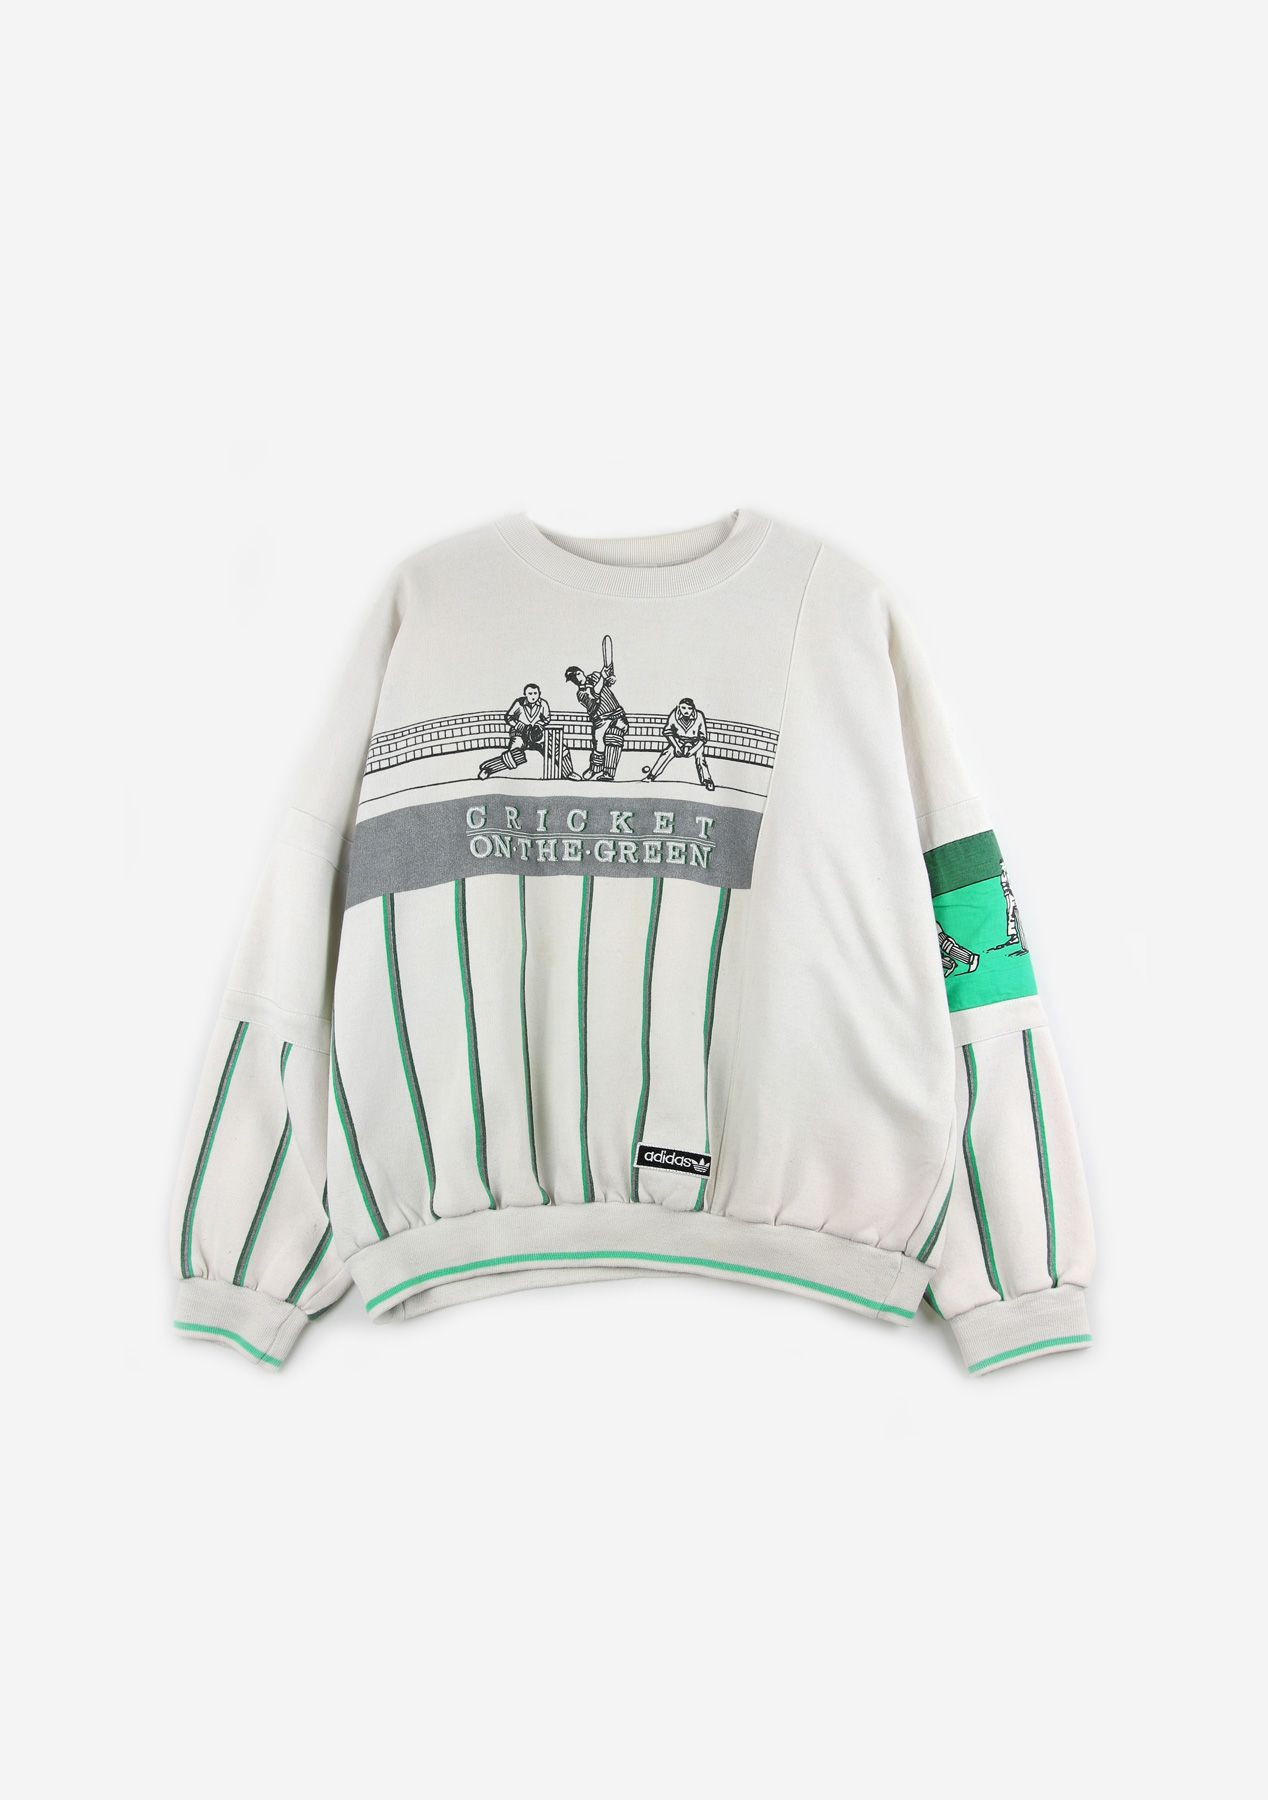 Adidas Cricket On the green sweatshirt | Rare vintage Adidas